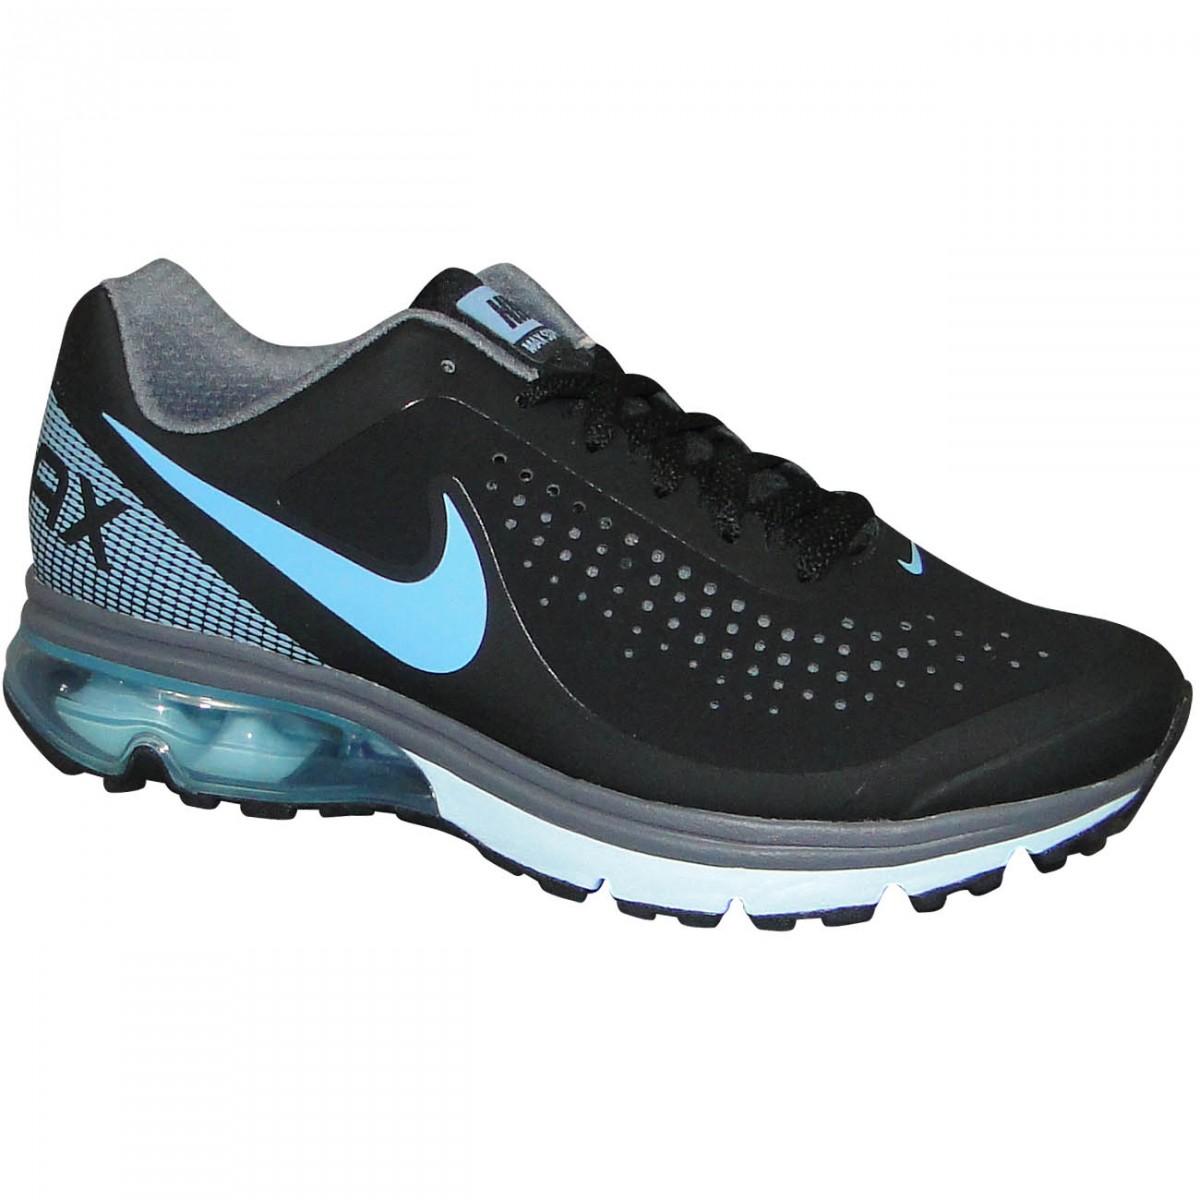 e1aa1b69a20 Tenis Nike Air Max Supreme 2 633061 002 - Preto Celeste - Chuteira ...